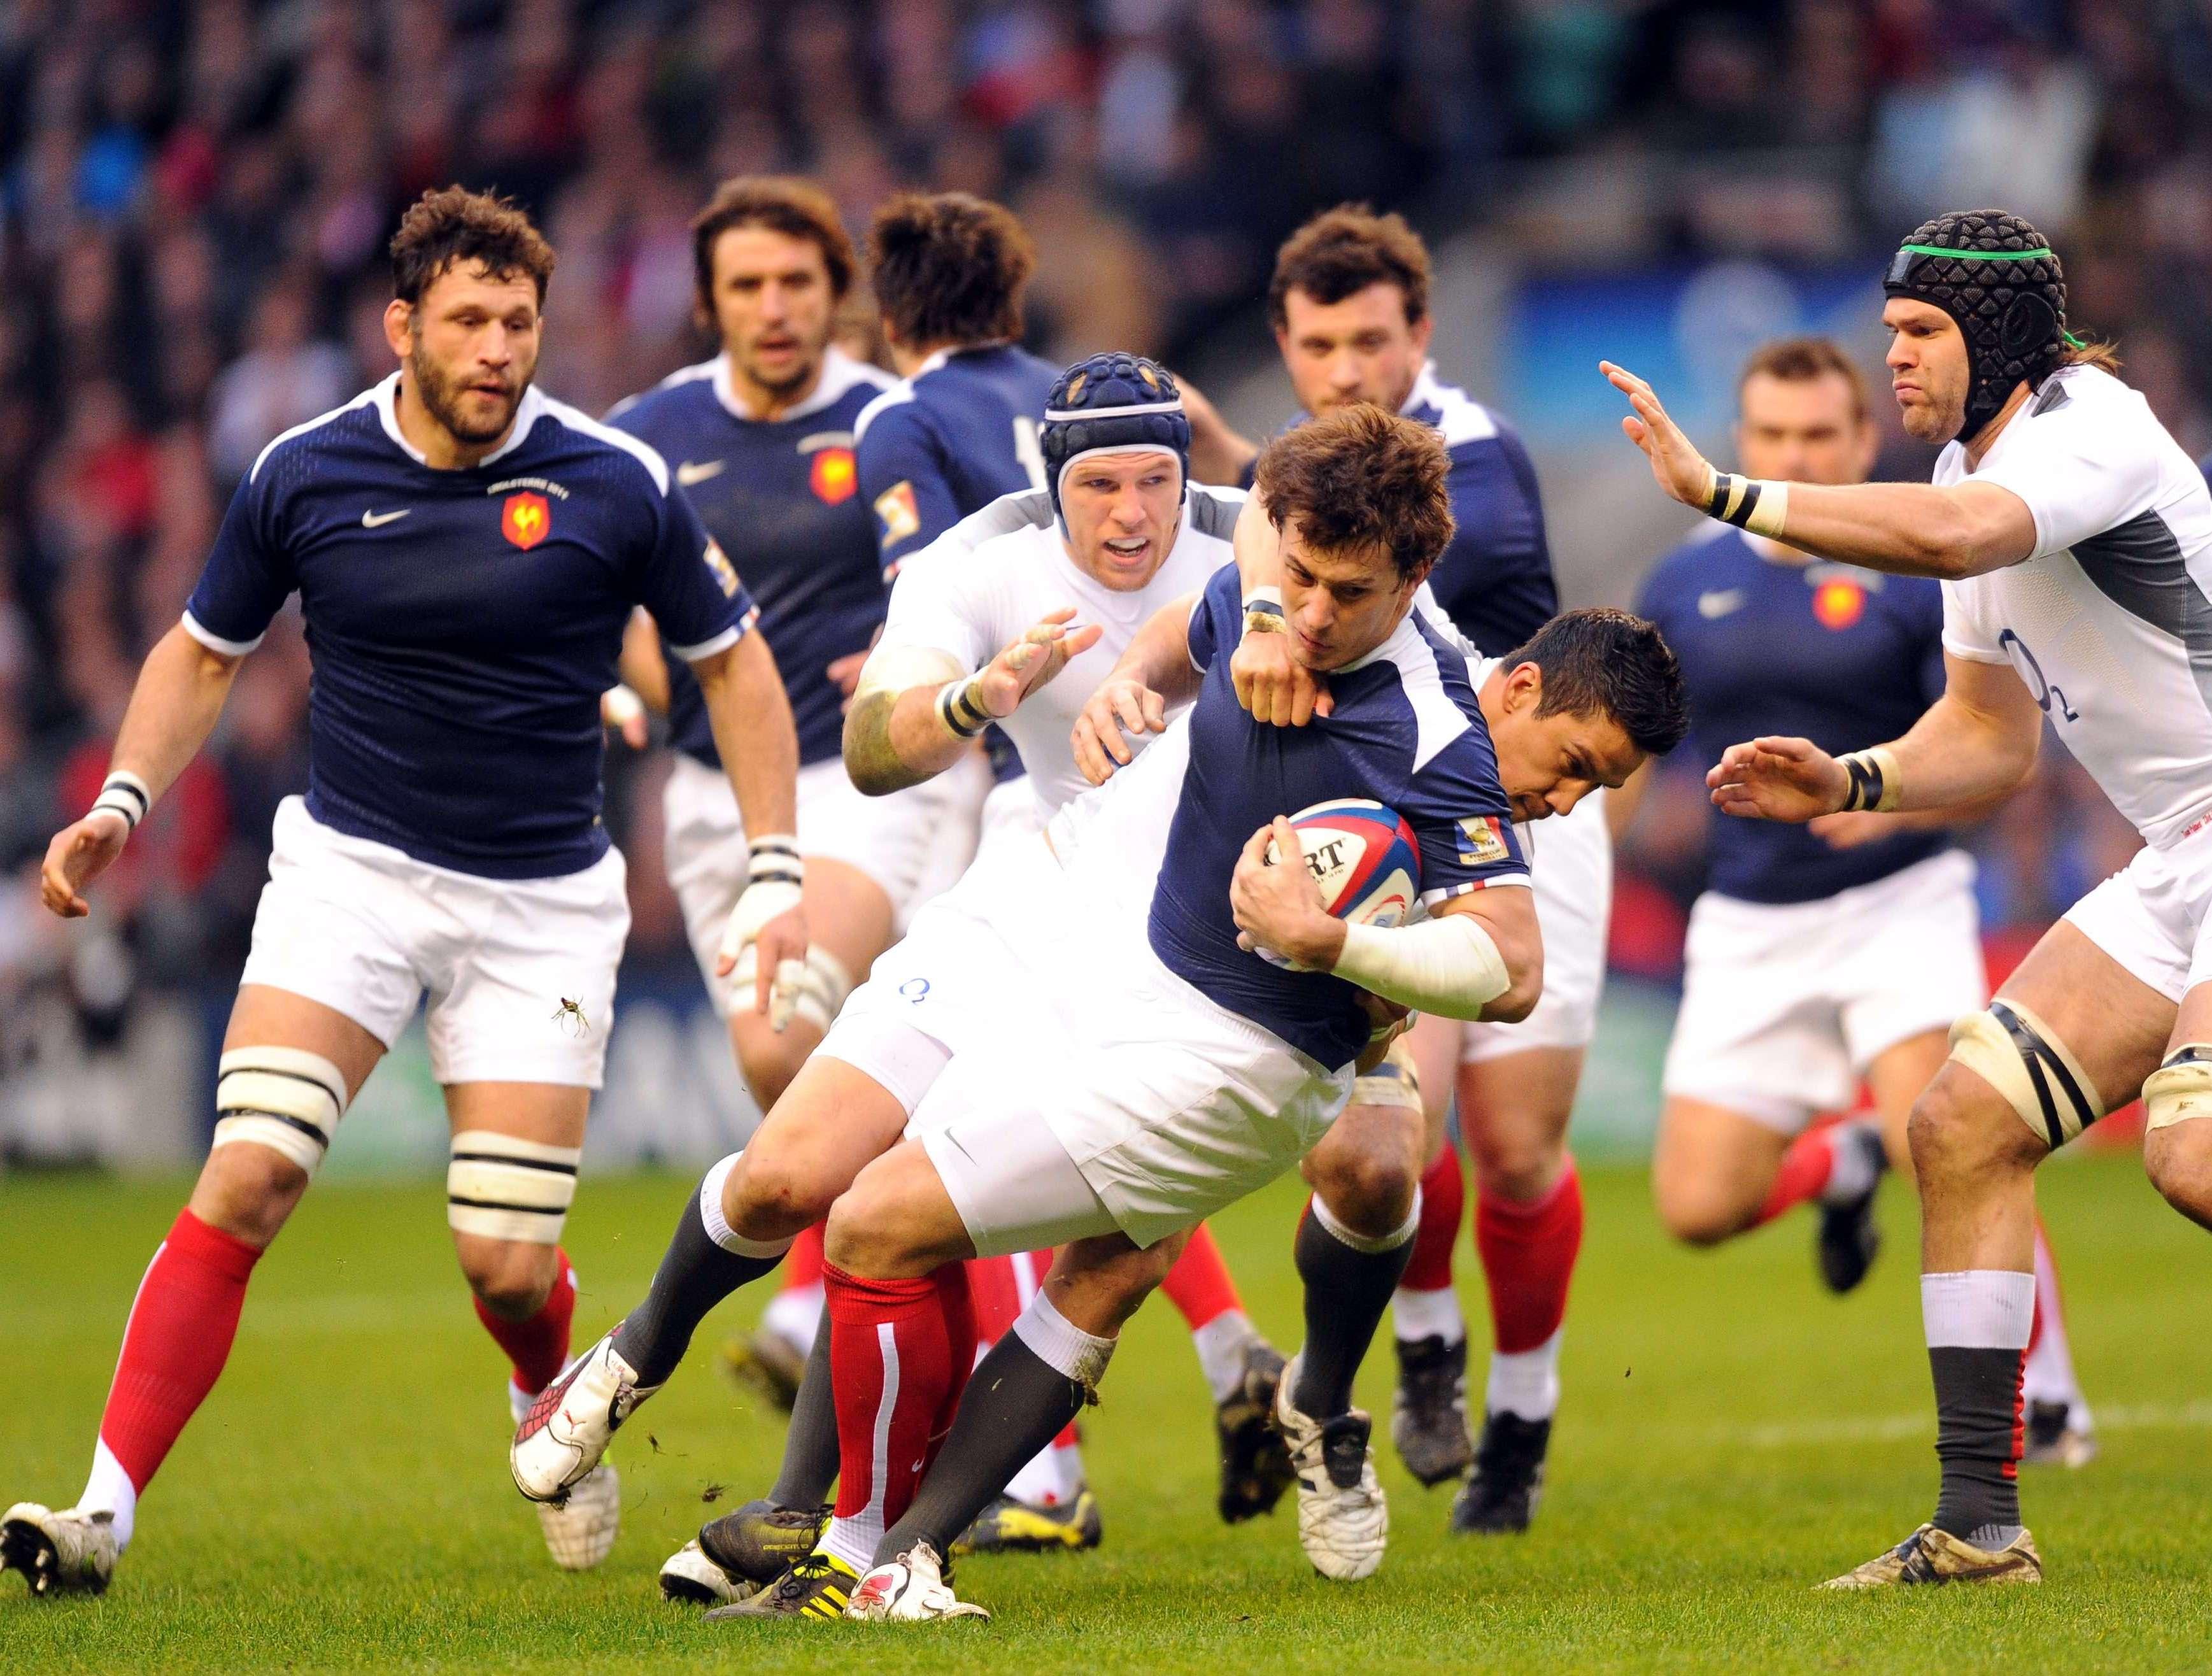 Rugbysource: racing-1.com